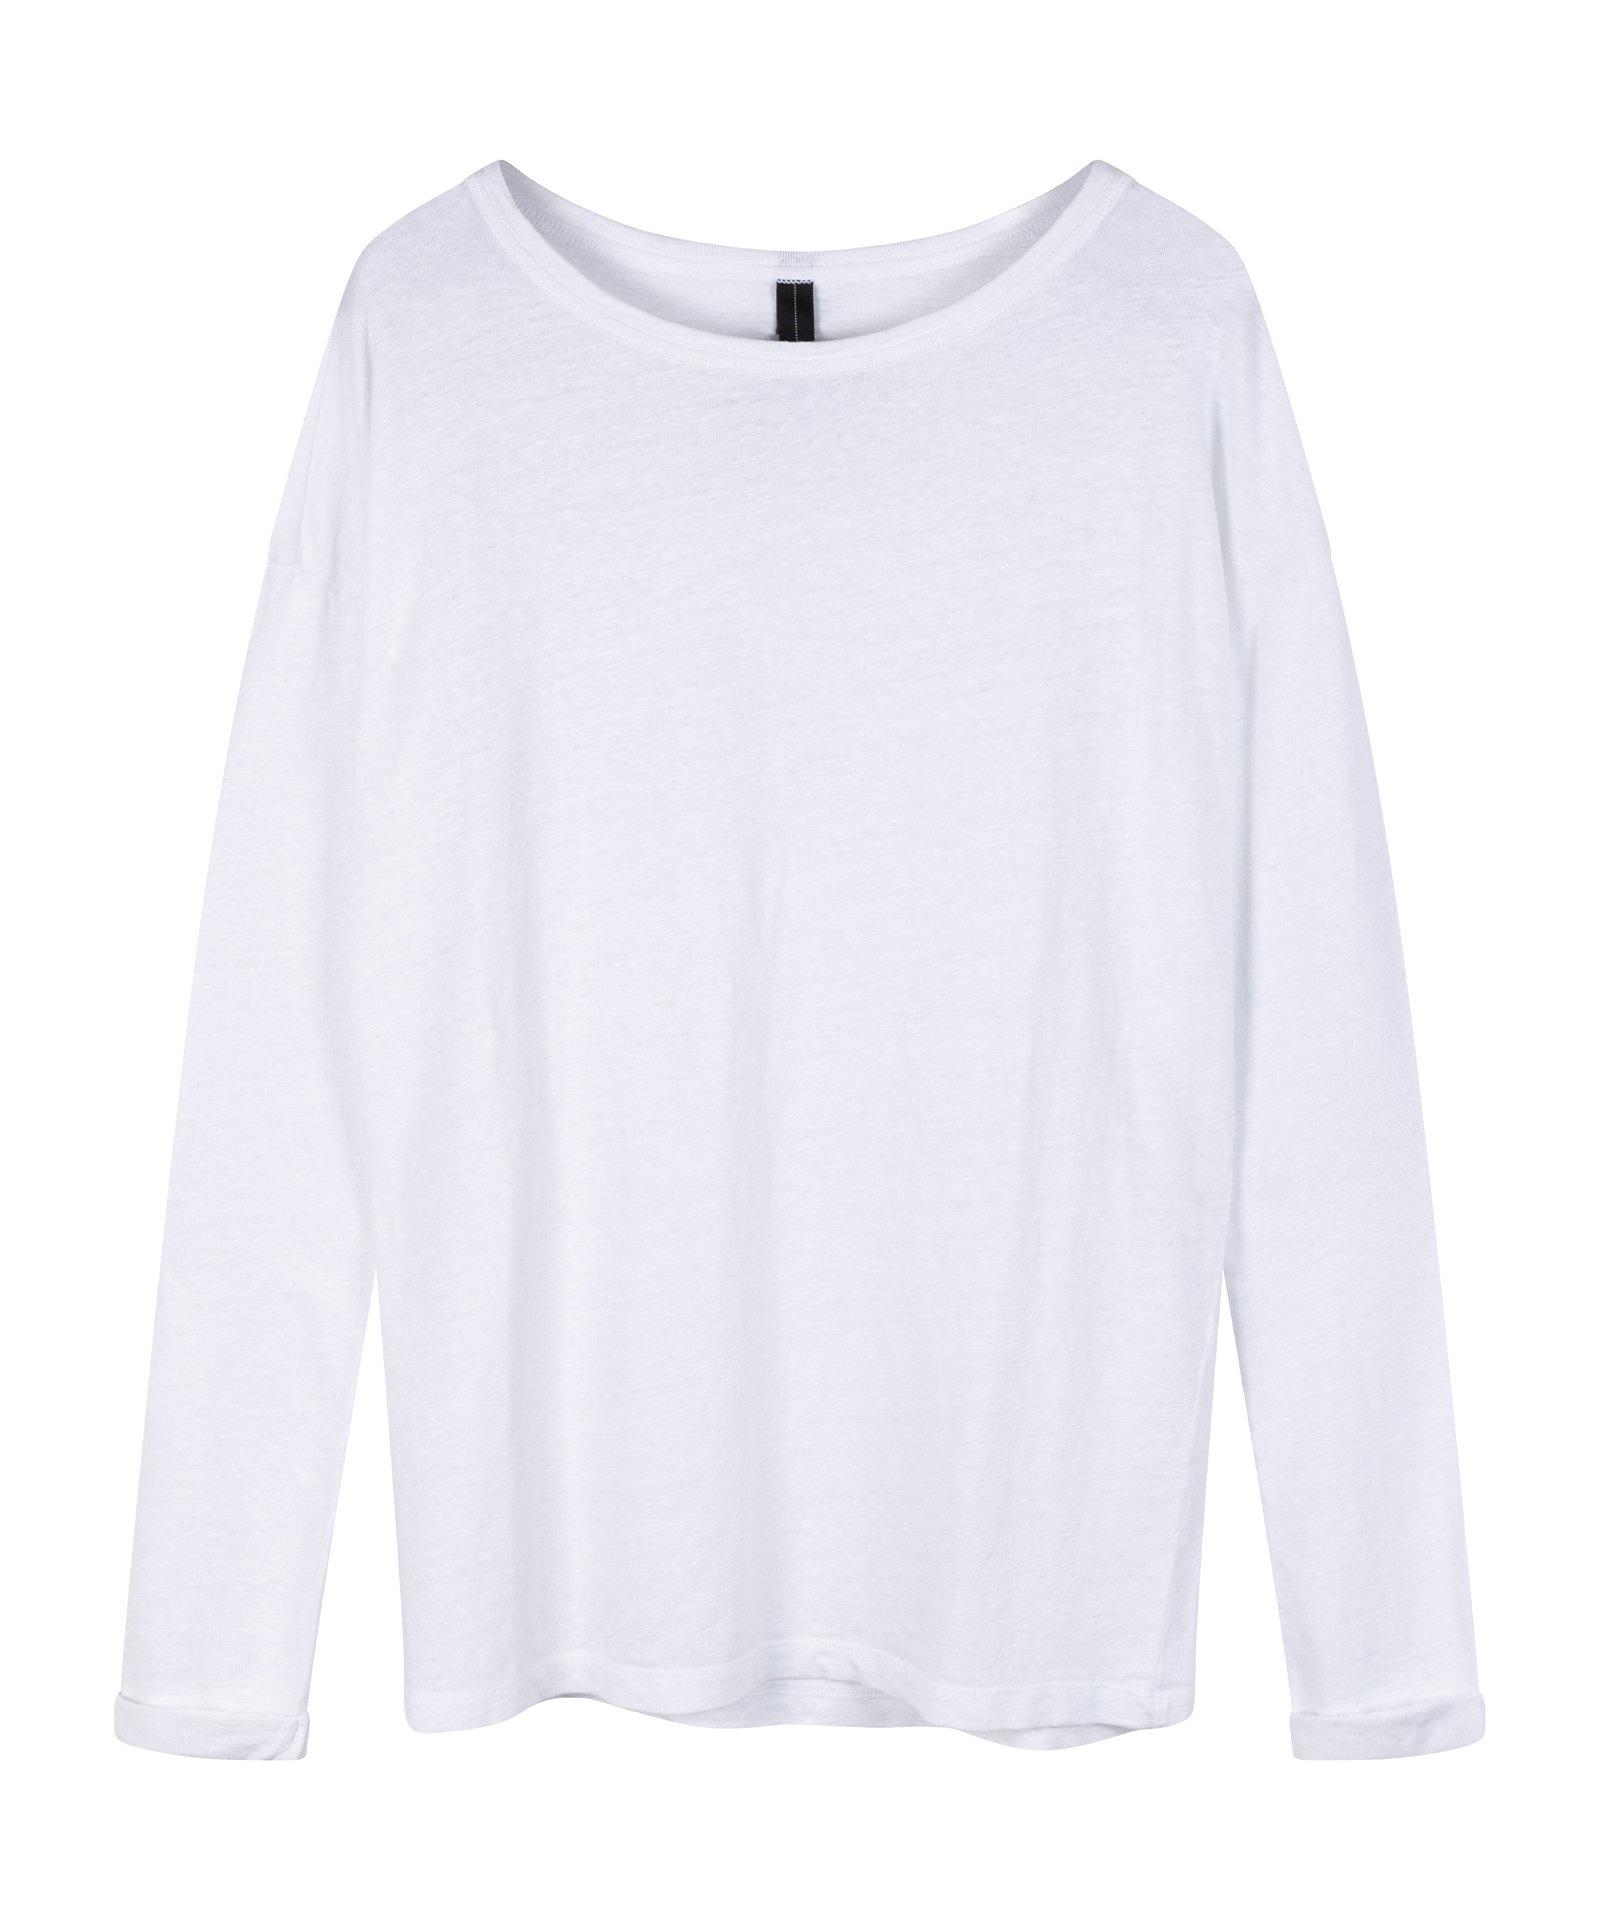 Top longsleeve tee linen white-1